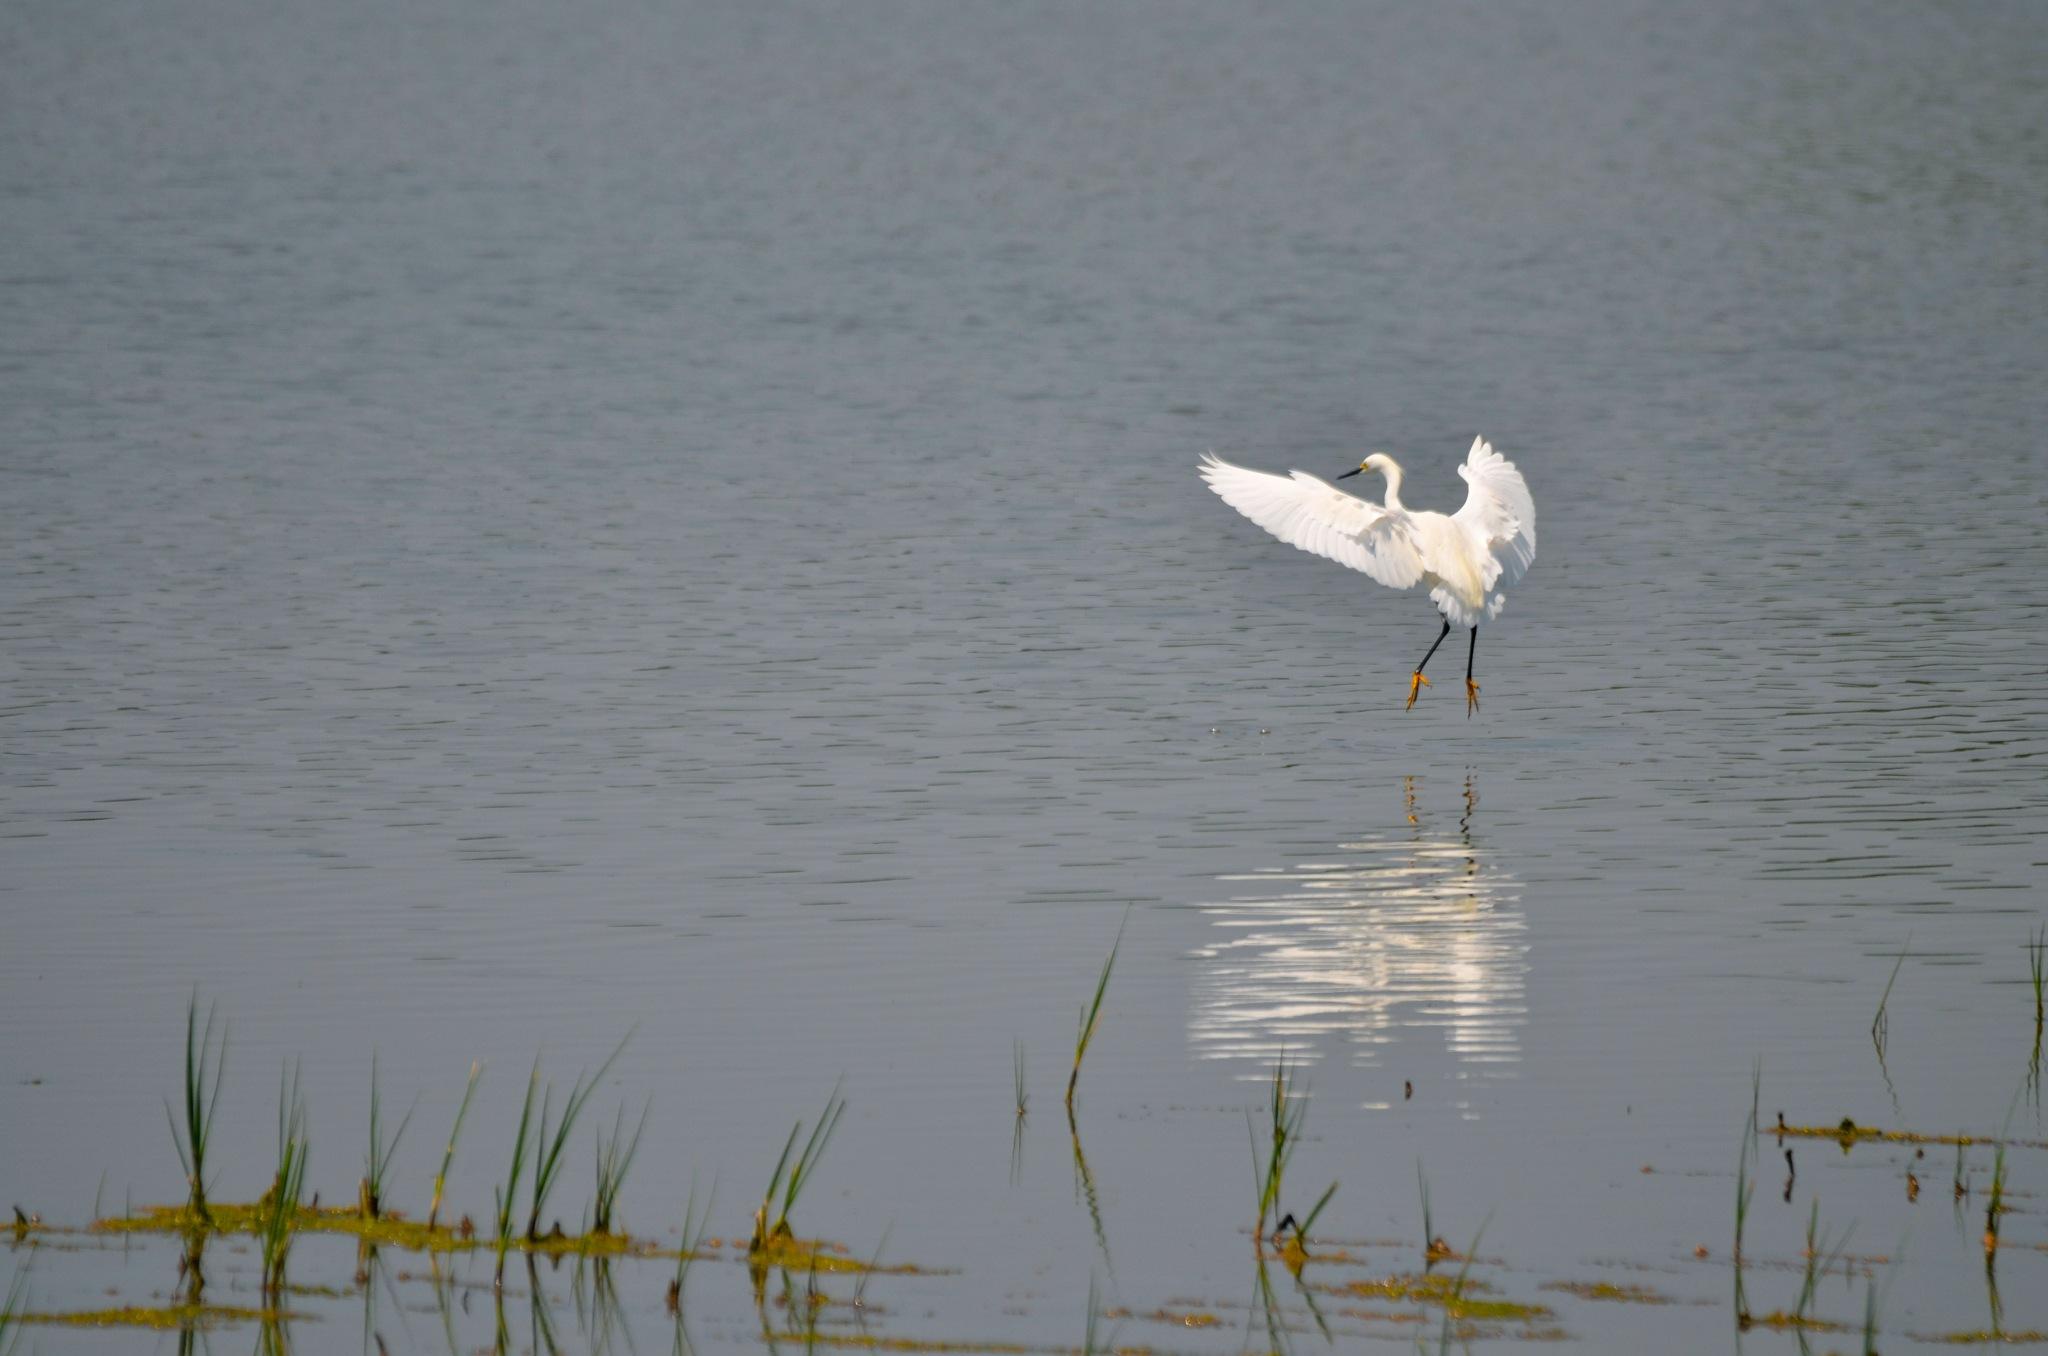 Dancing egret by Lana-photo-Art